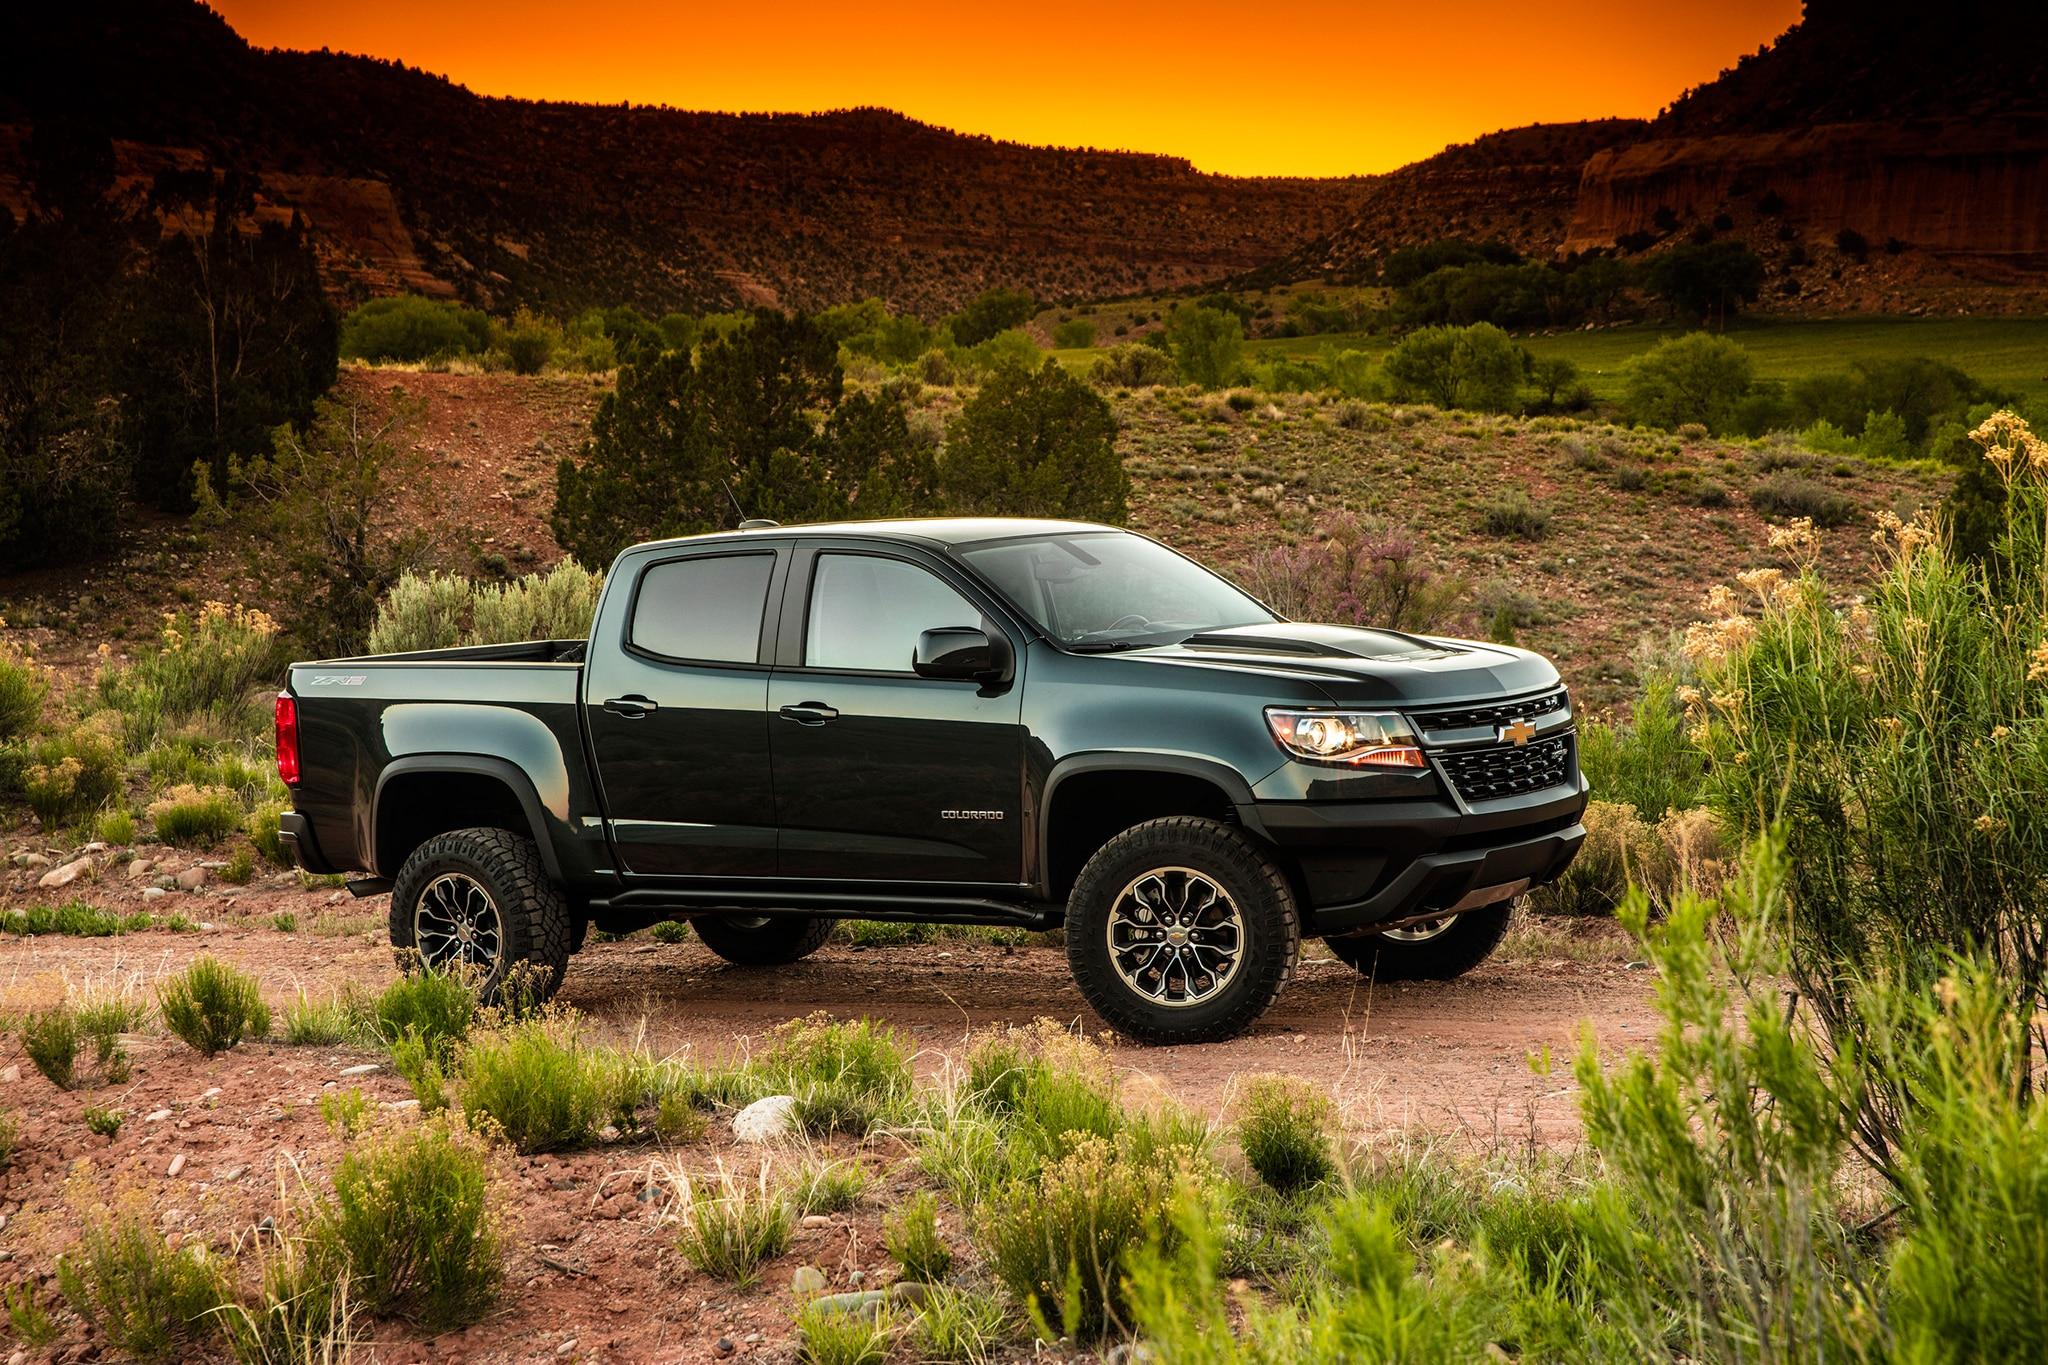 2019 Chevrolet Colorado ZR2 Review: Capable—and Safe, Too ...